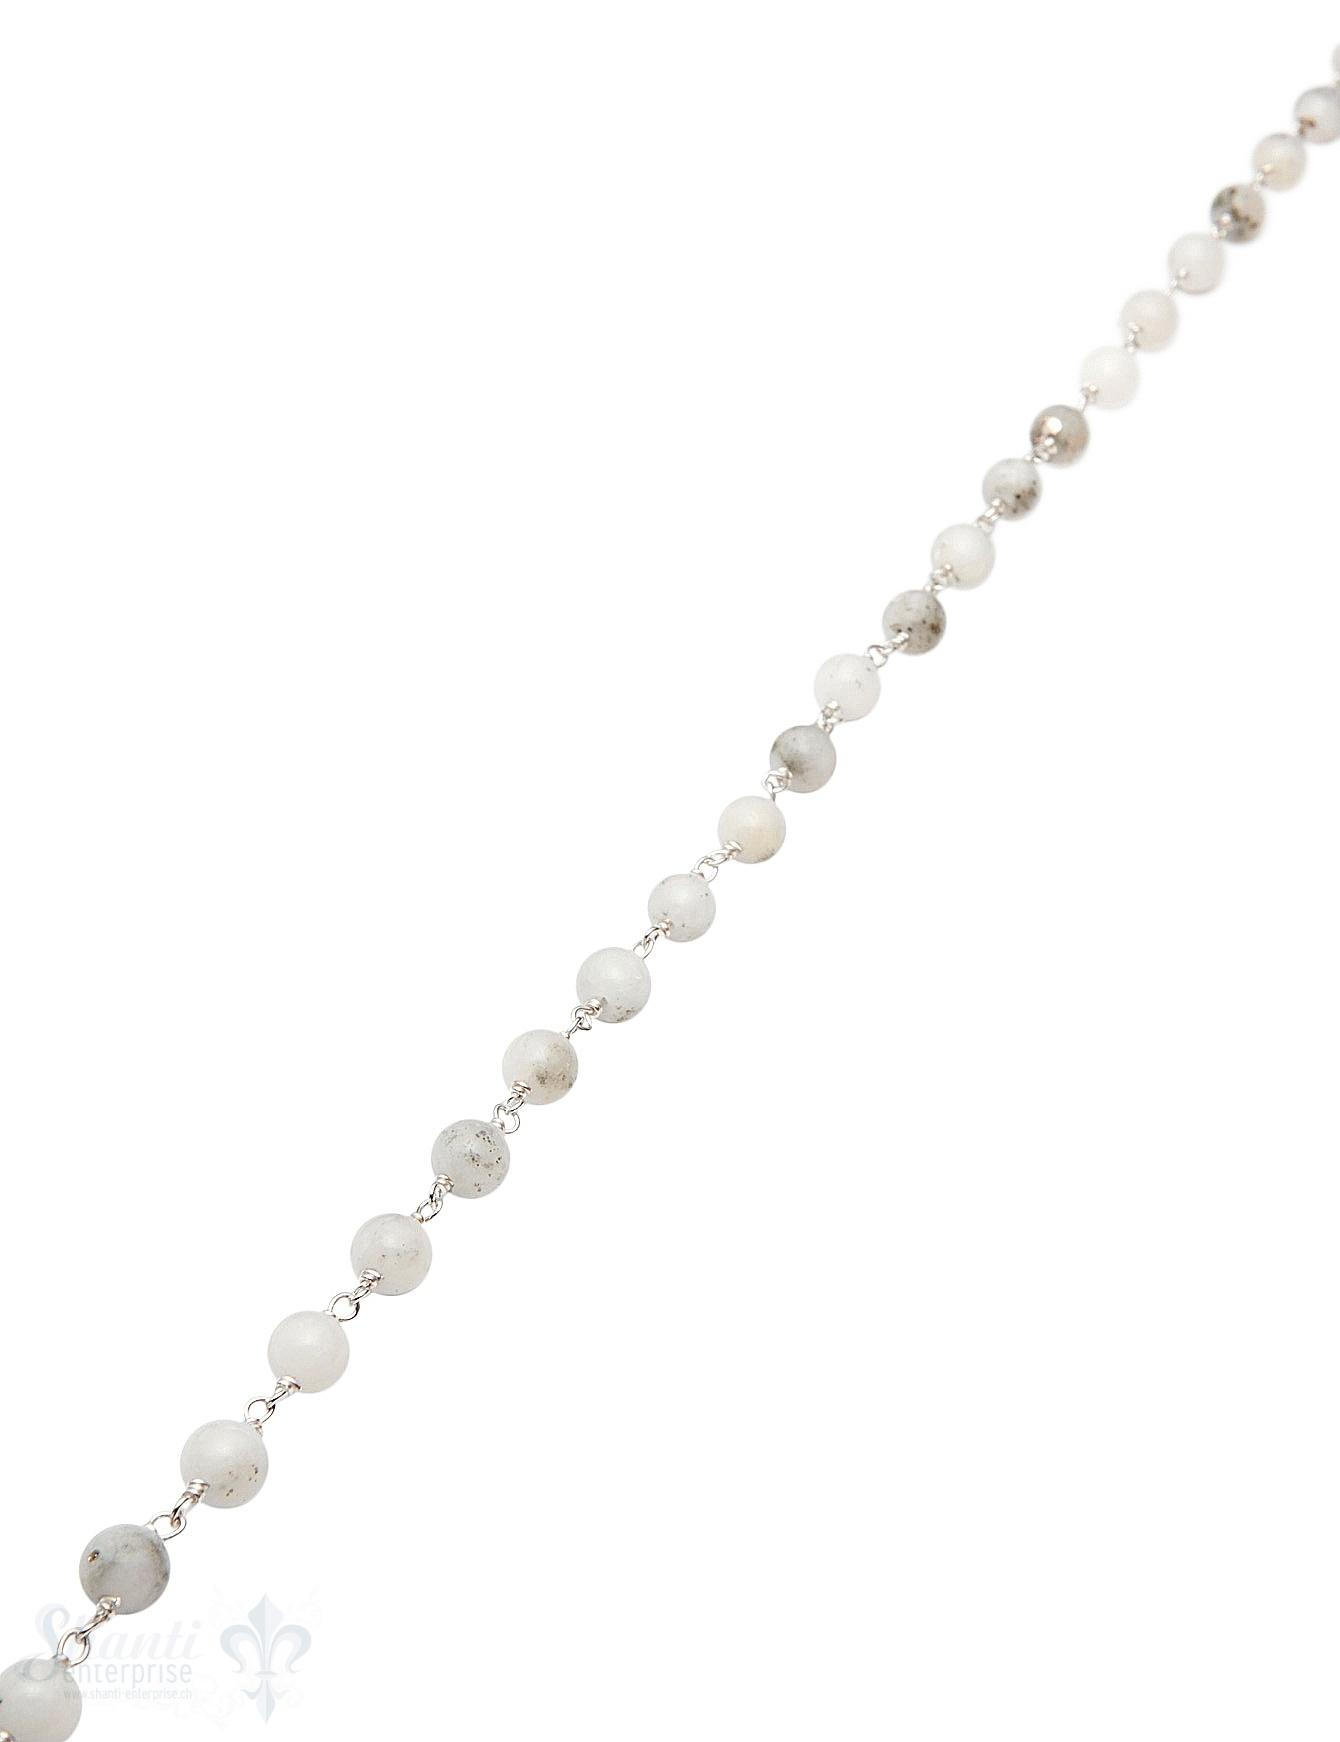 Rosenkranzkette Magnesit weiss poliert Silber  Abschnittlänge wird angepasst Preis per m